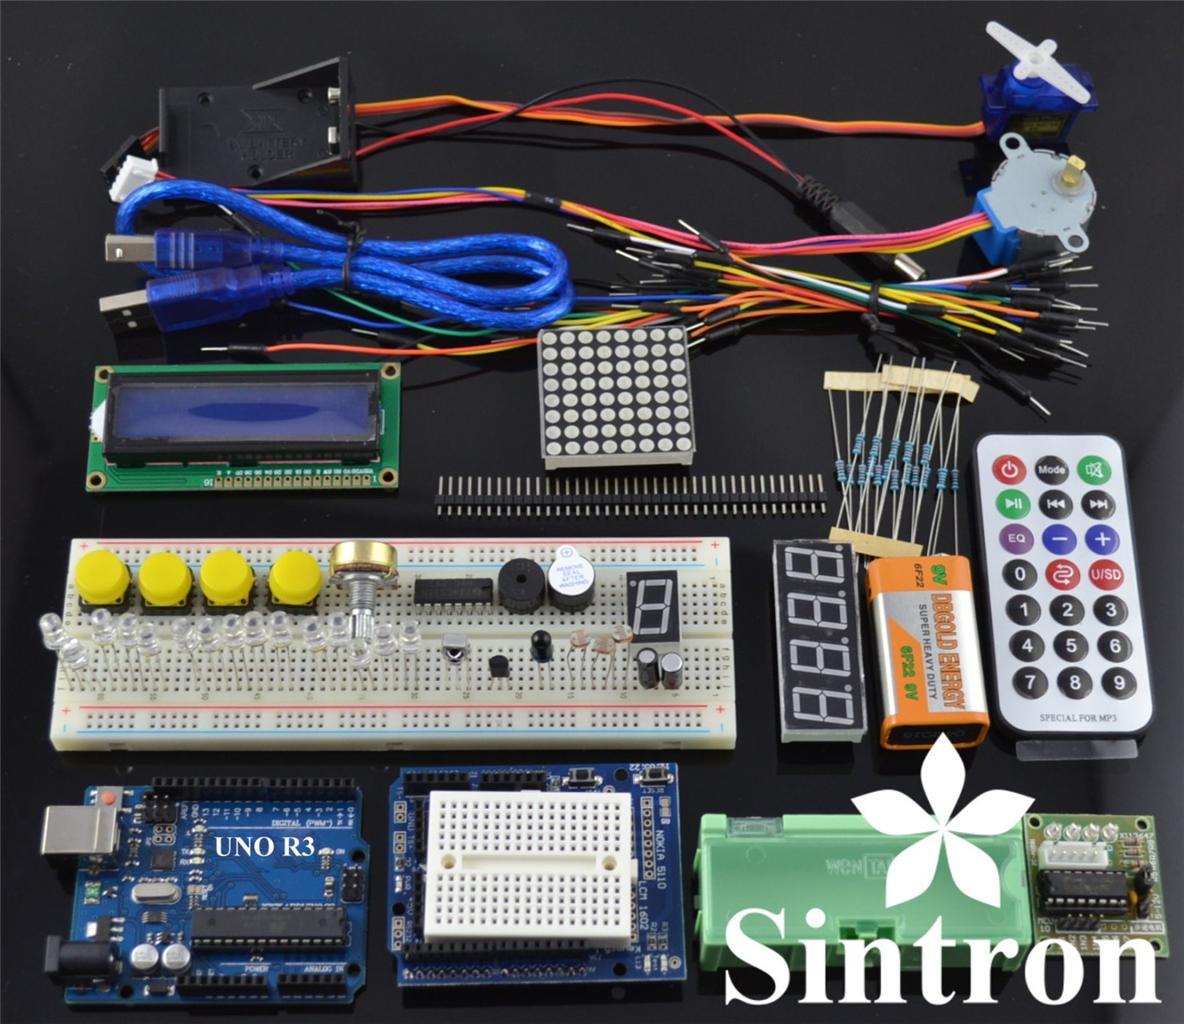 Uno R3 Starter Kit 1602 Lcd Servo Motor Dot Matrix Breadboard Led Circuit Kits For Beginners Sintron Arduino Upgrade